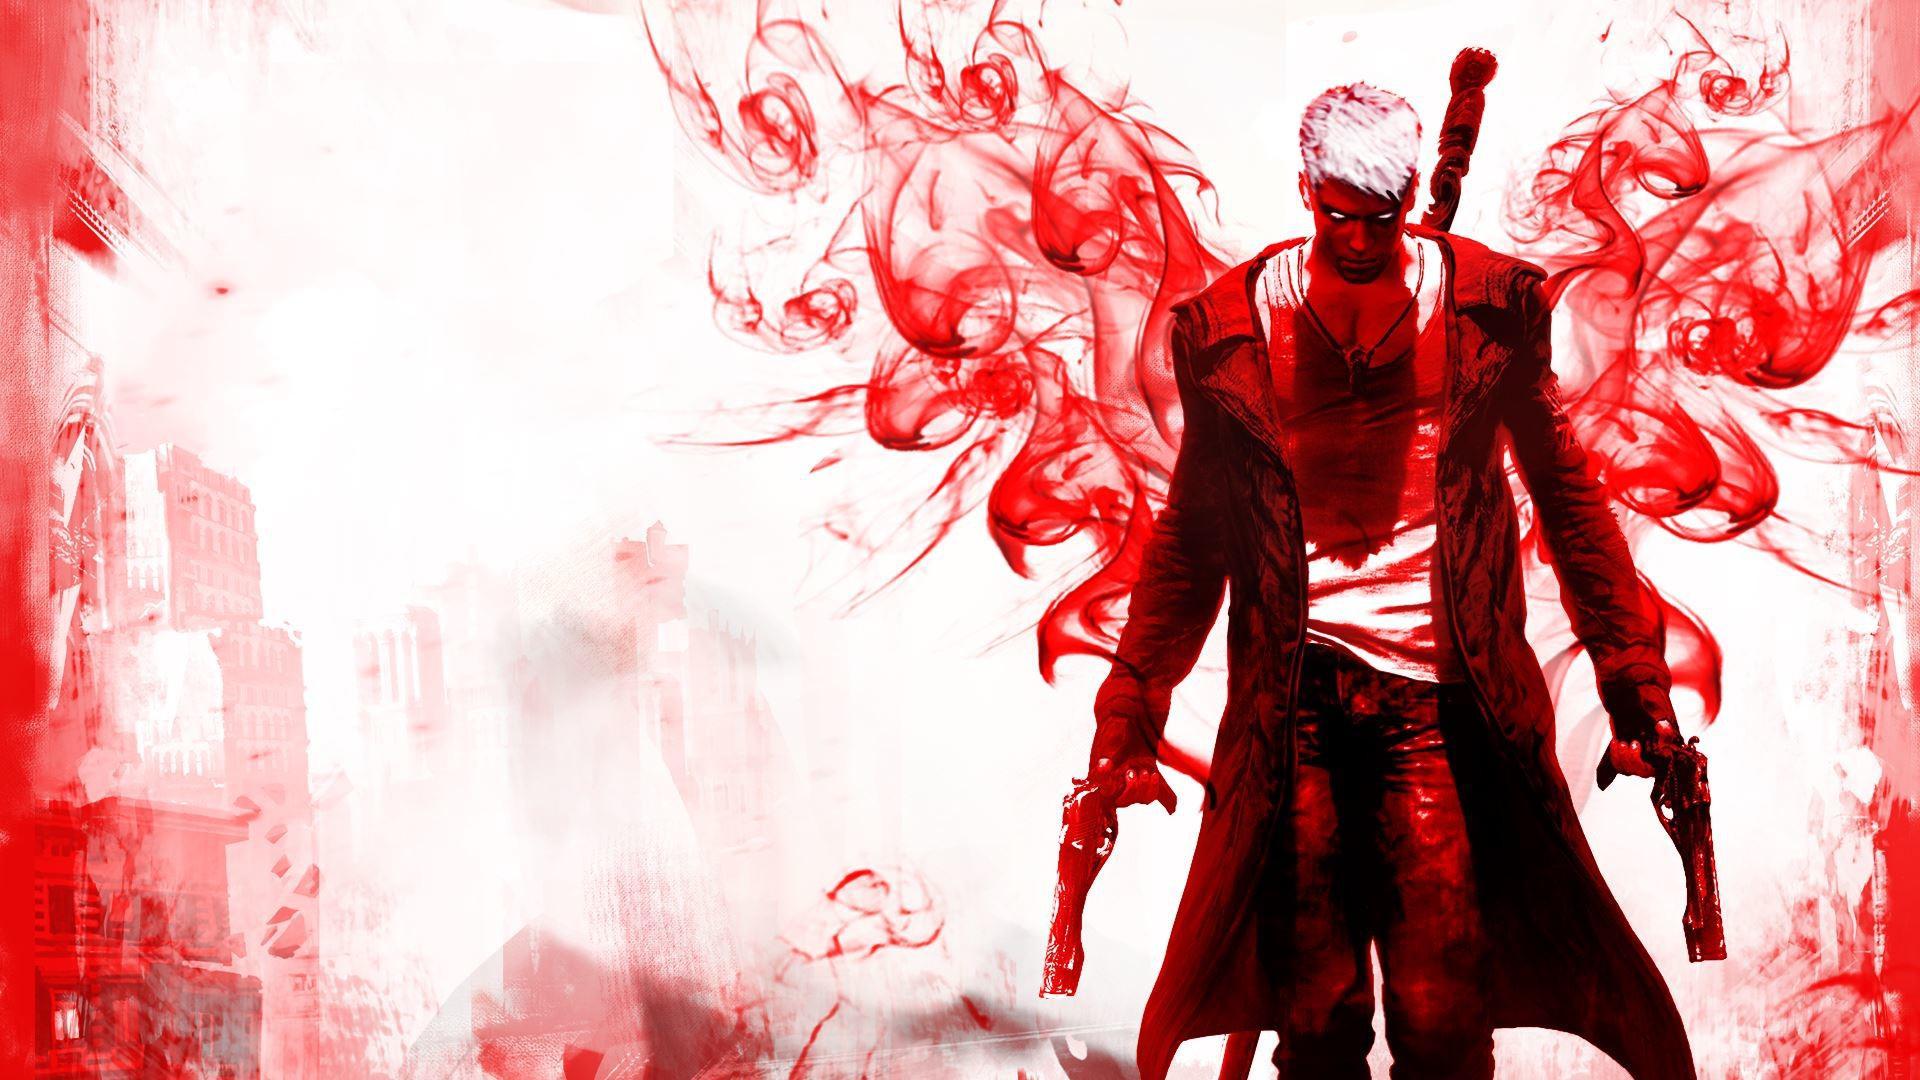 Devil May Cry Hd Desktop Wallpaper Widescreen High Definition